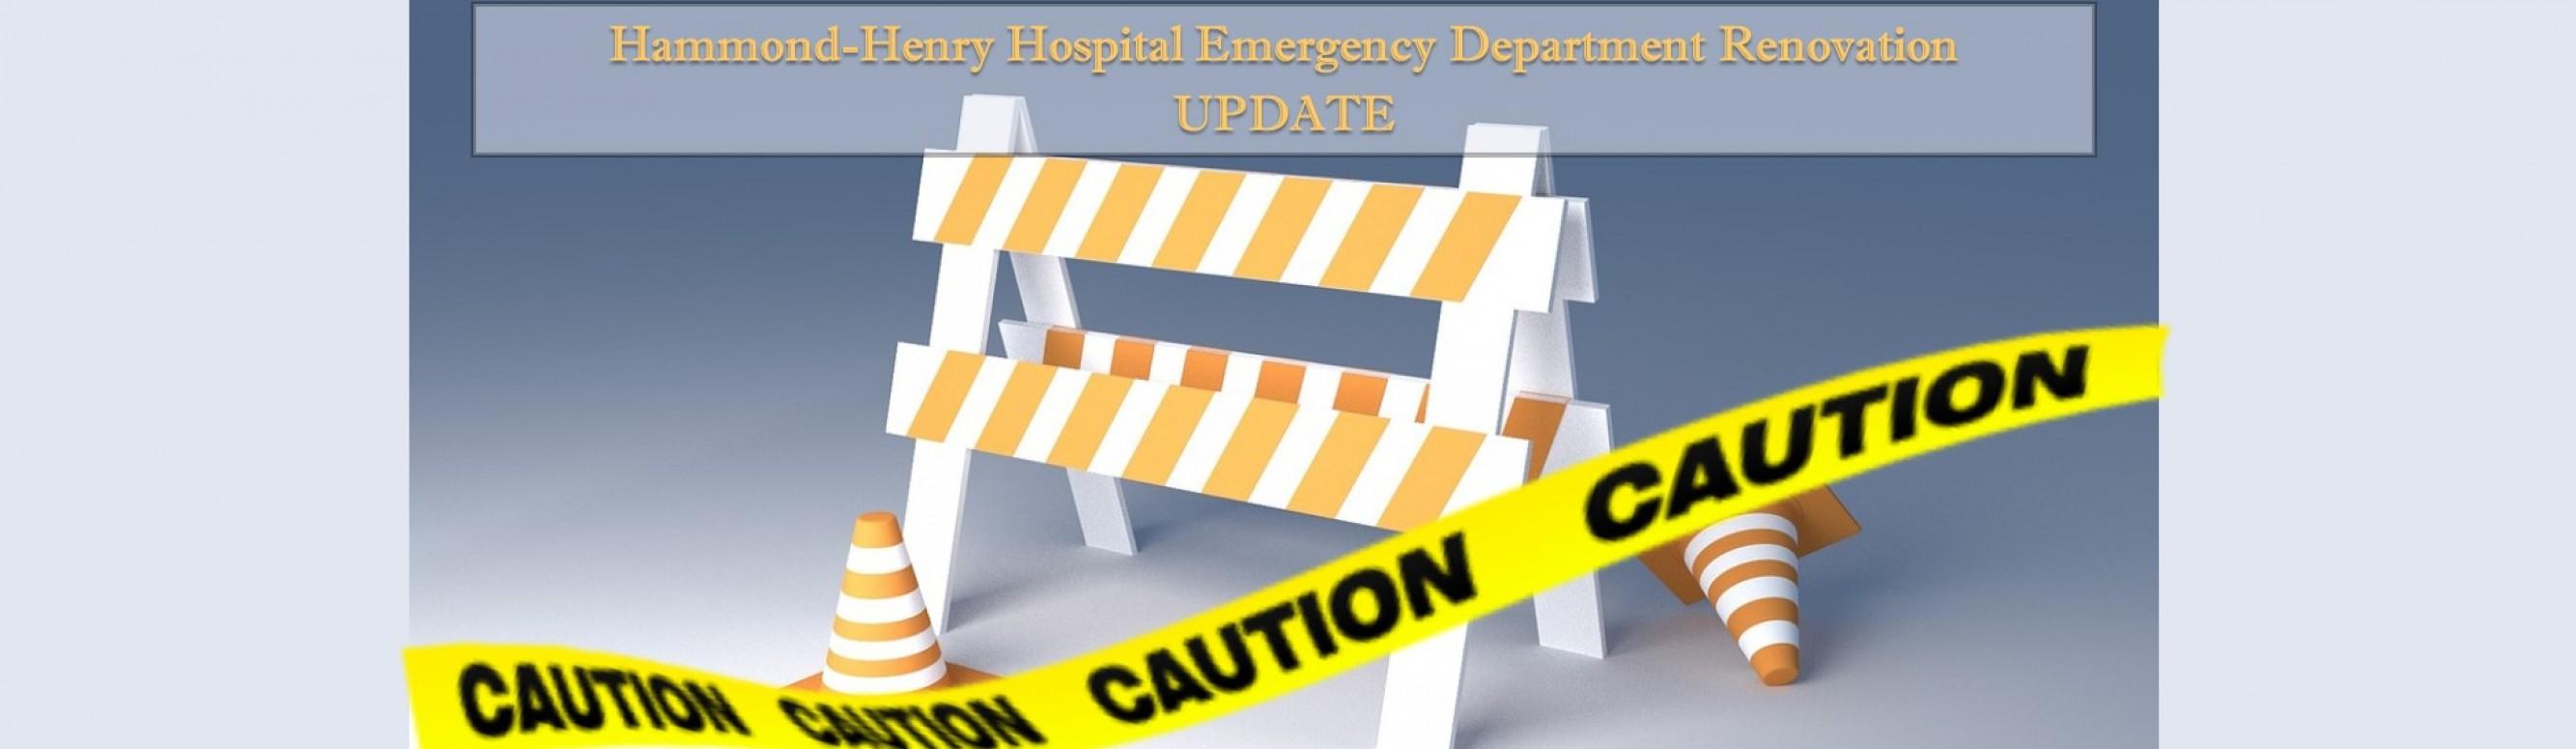 Hammond Henry Hospital